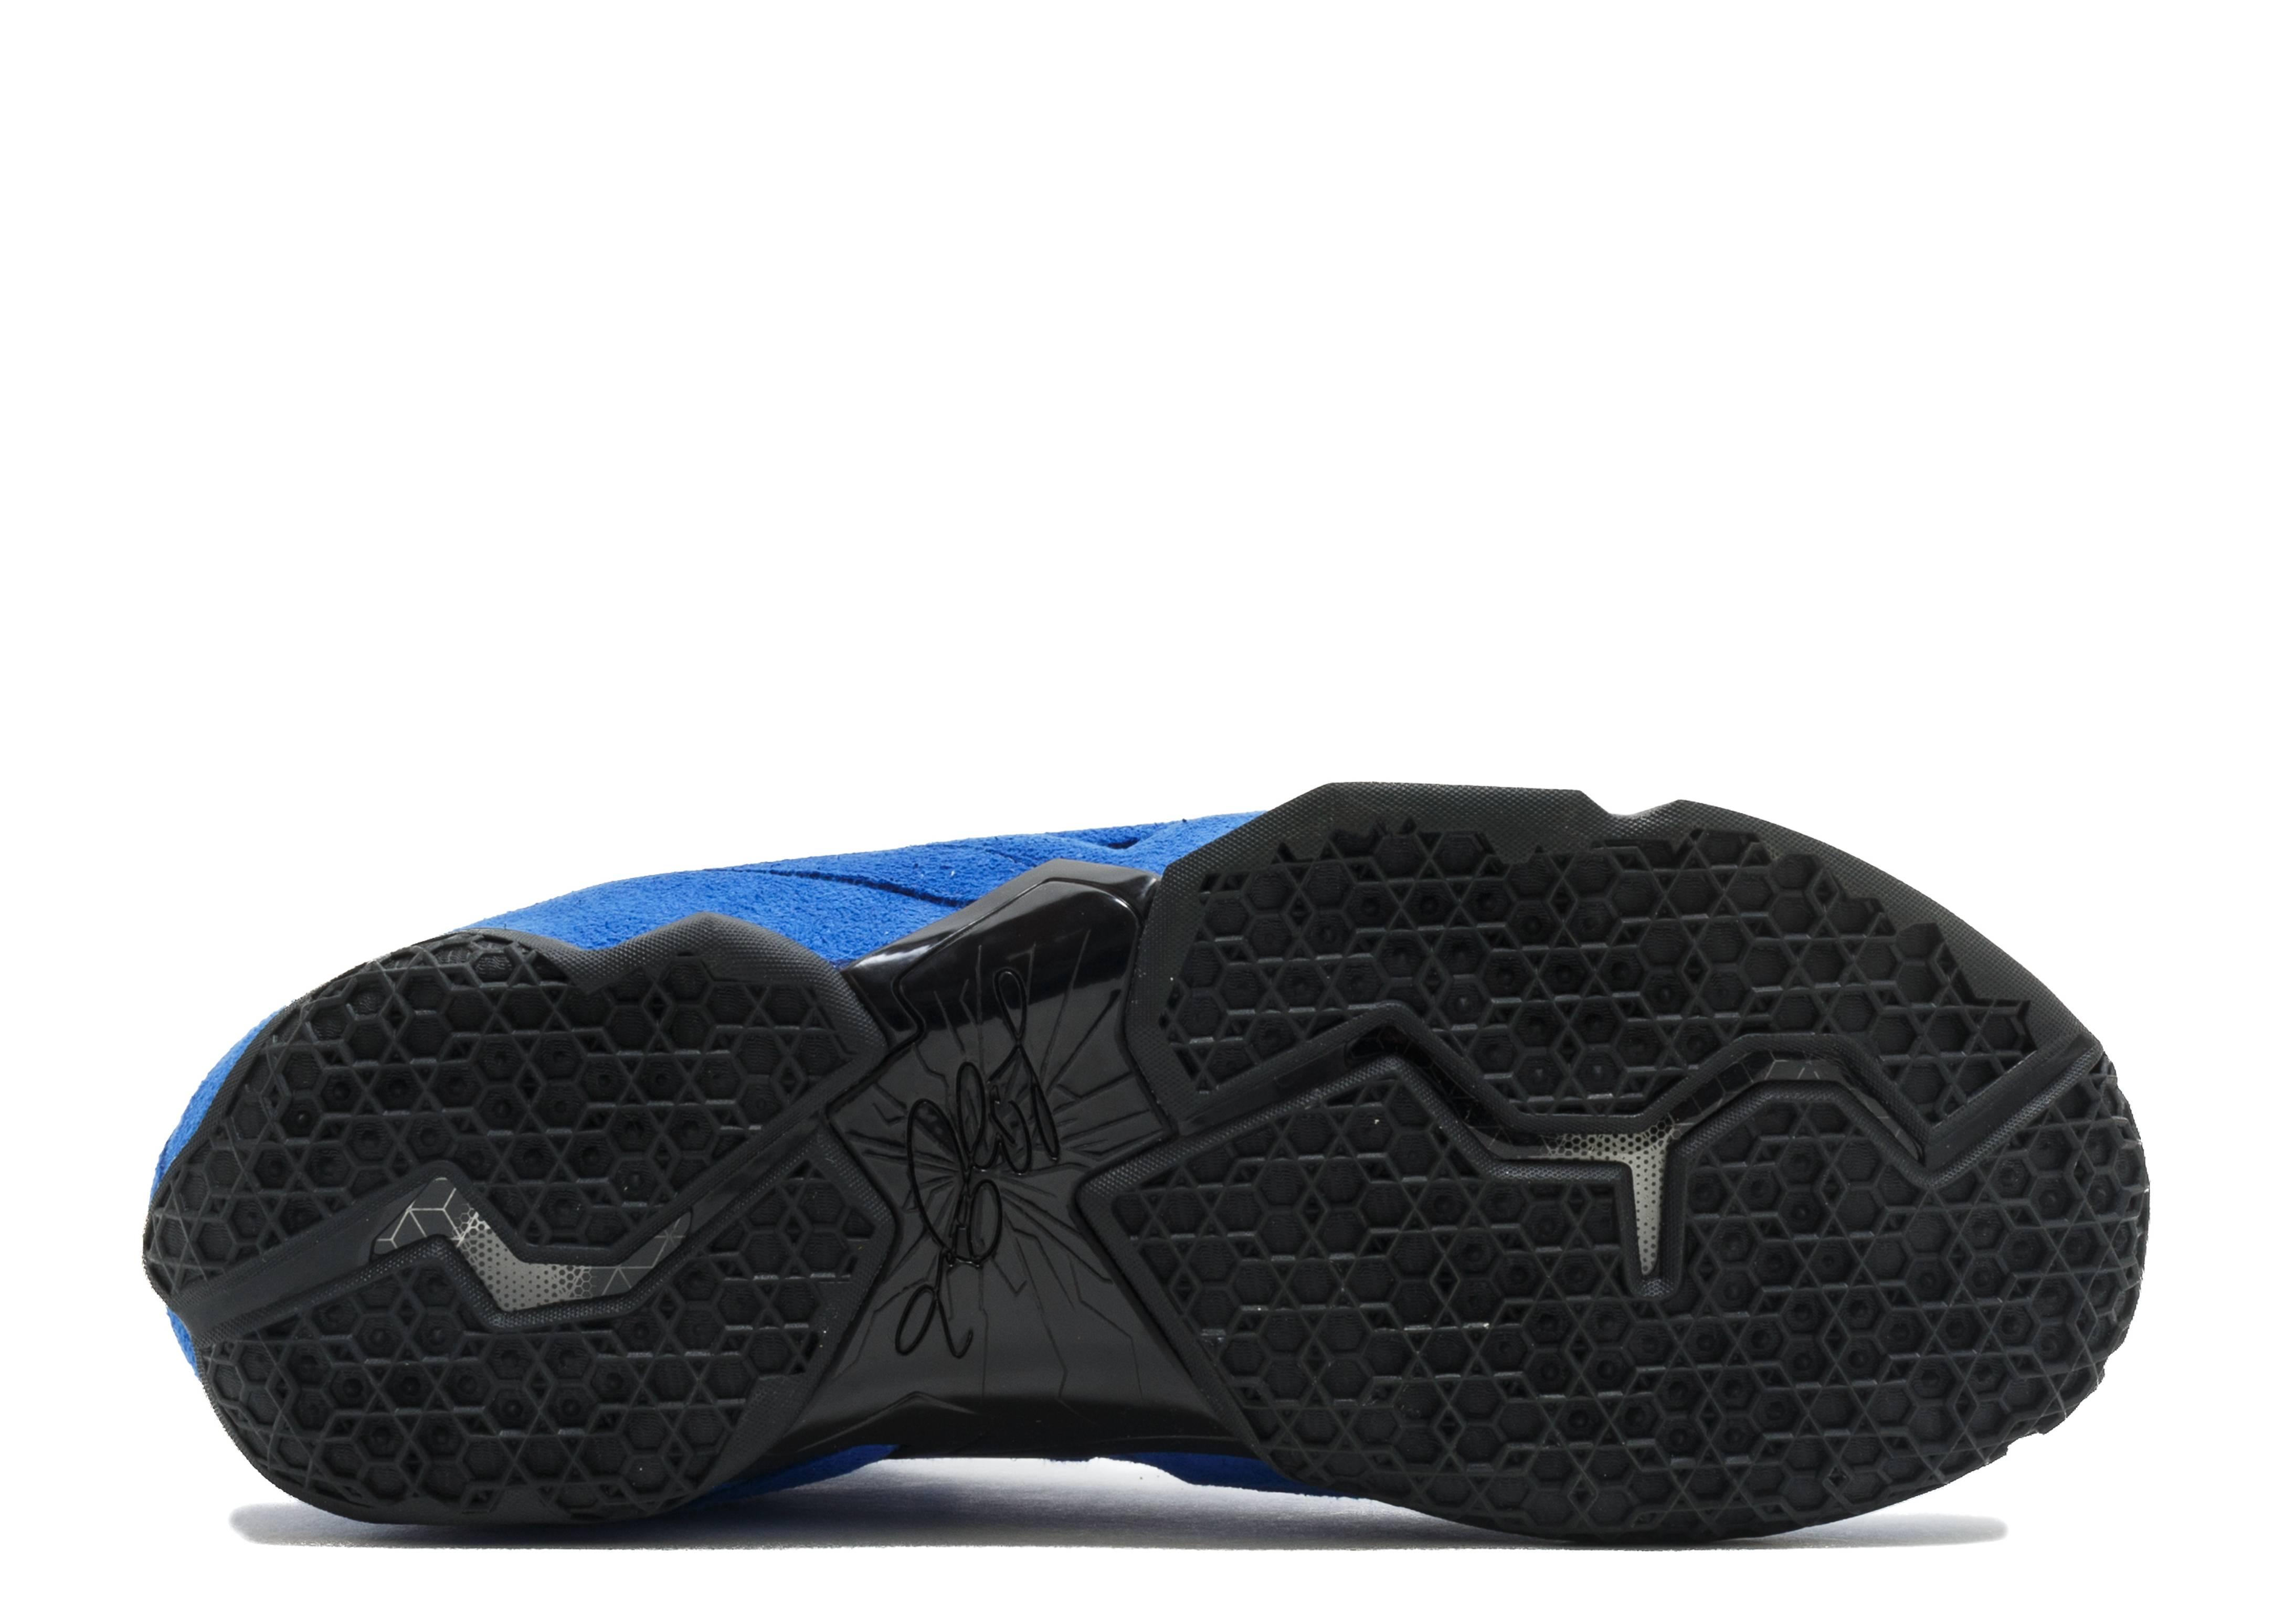 Lebron 11 Ext Suede Qs - Nike - 656274 440 - game royal game royal-black  59cddafb7